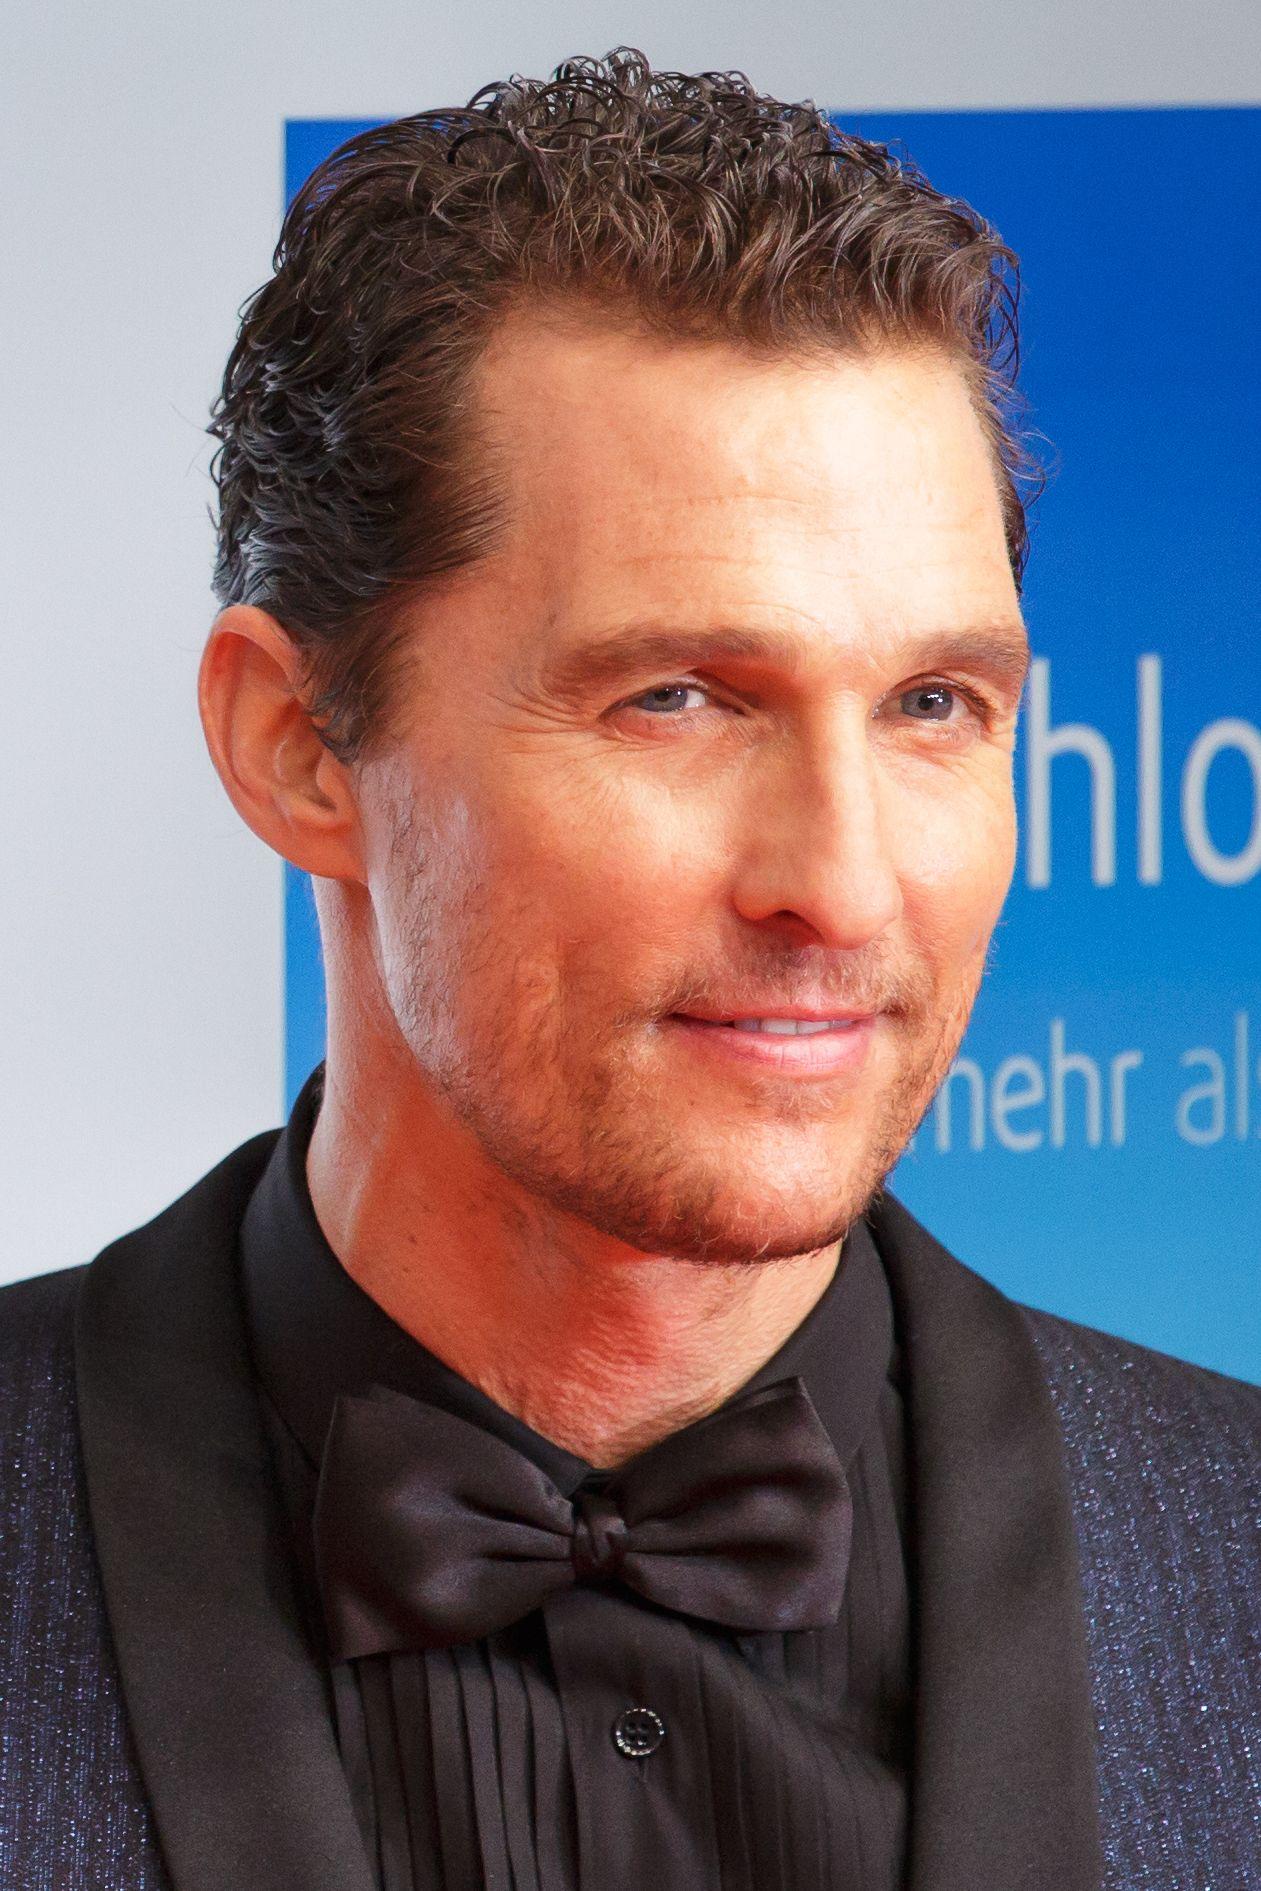 20. Matthew McConaughey – Revolving Doors